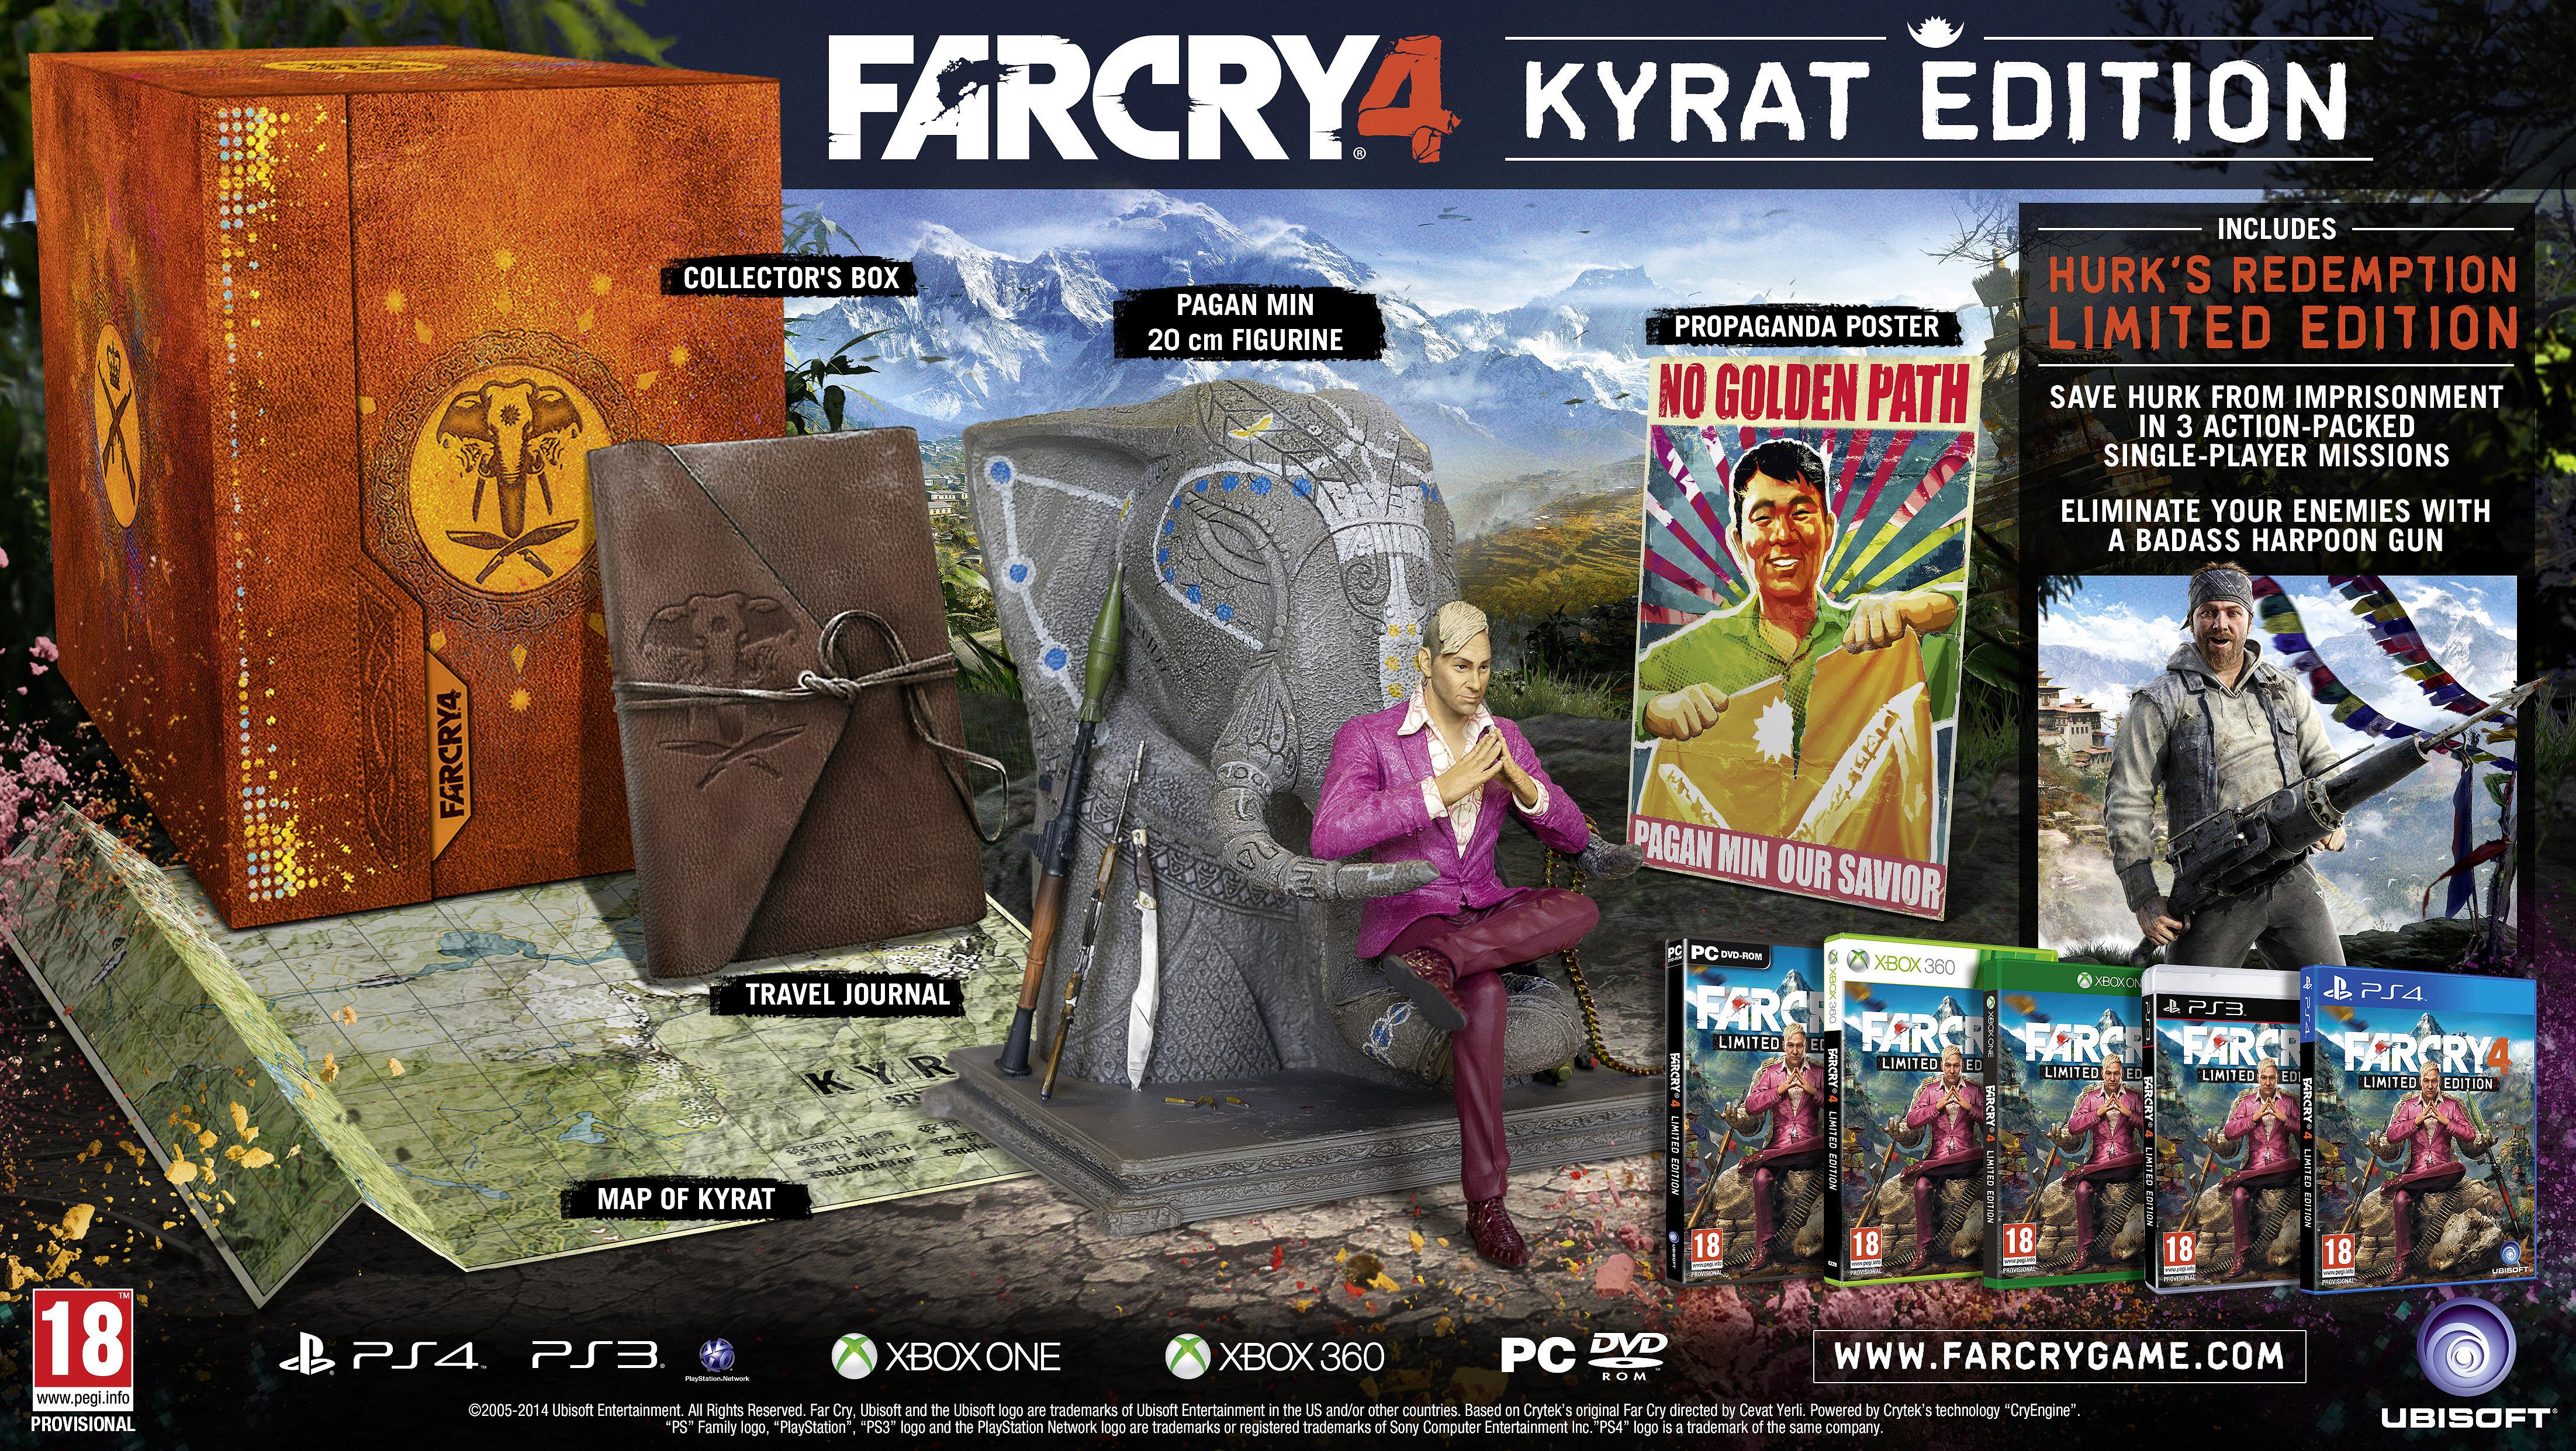 Far Cry 4 Kyrat Edition Details Thexboxhub